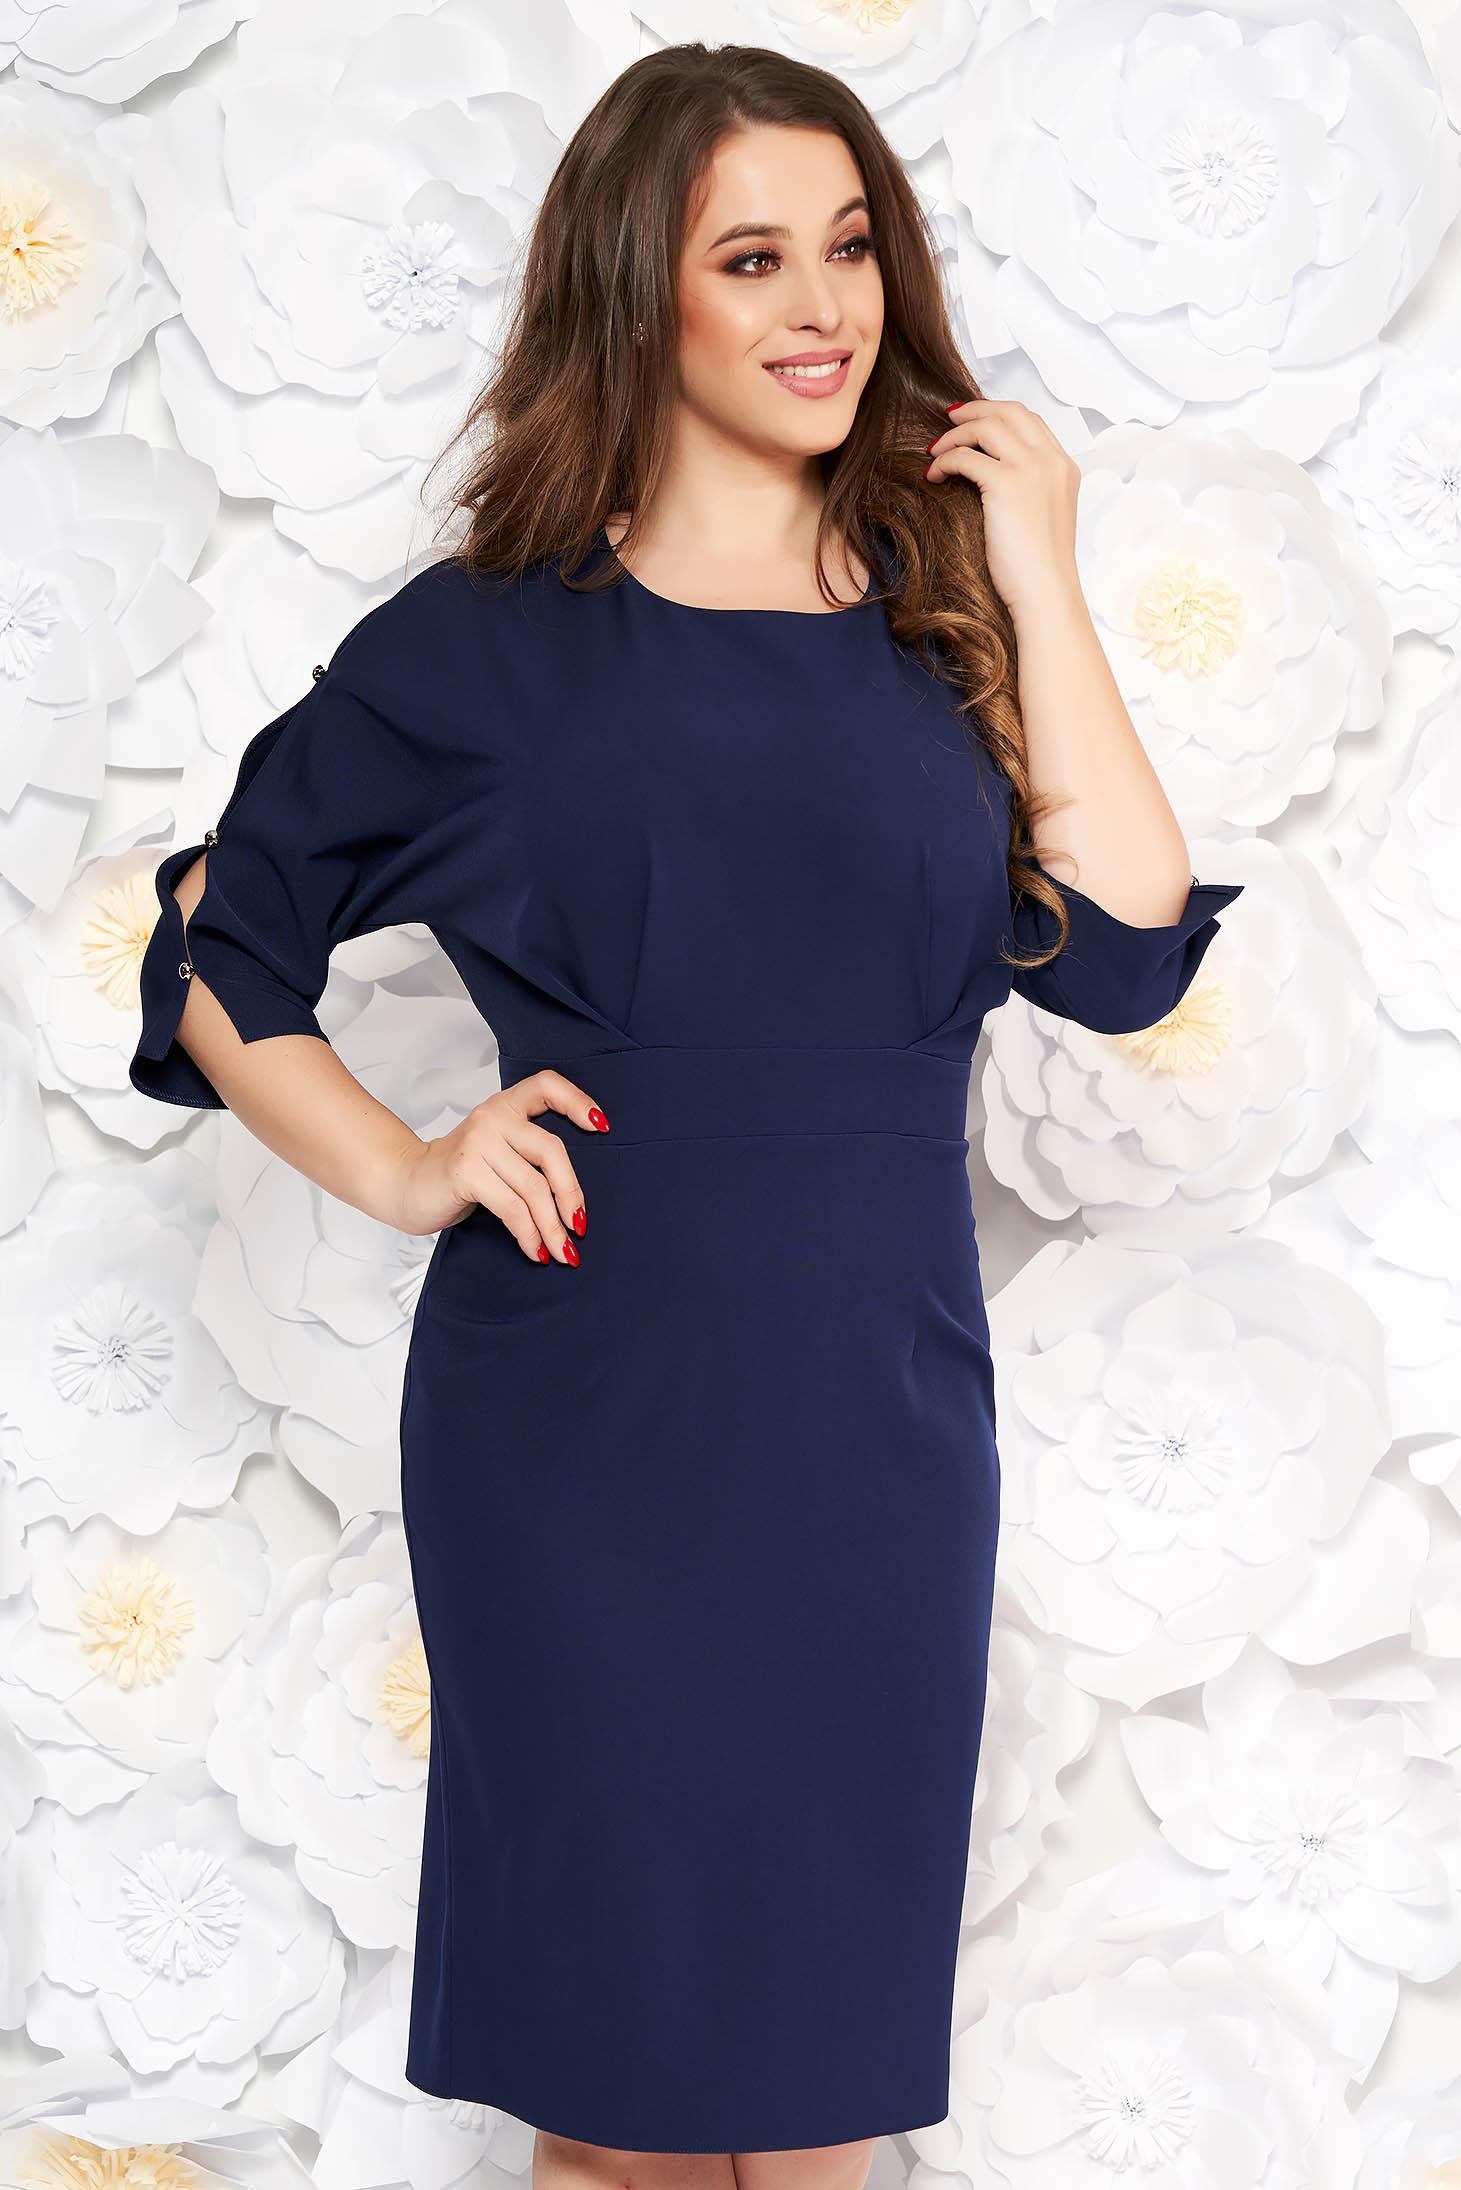 Darkblue elegant pencil dress slightly elastic fabric with cut-out sleeves